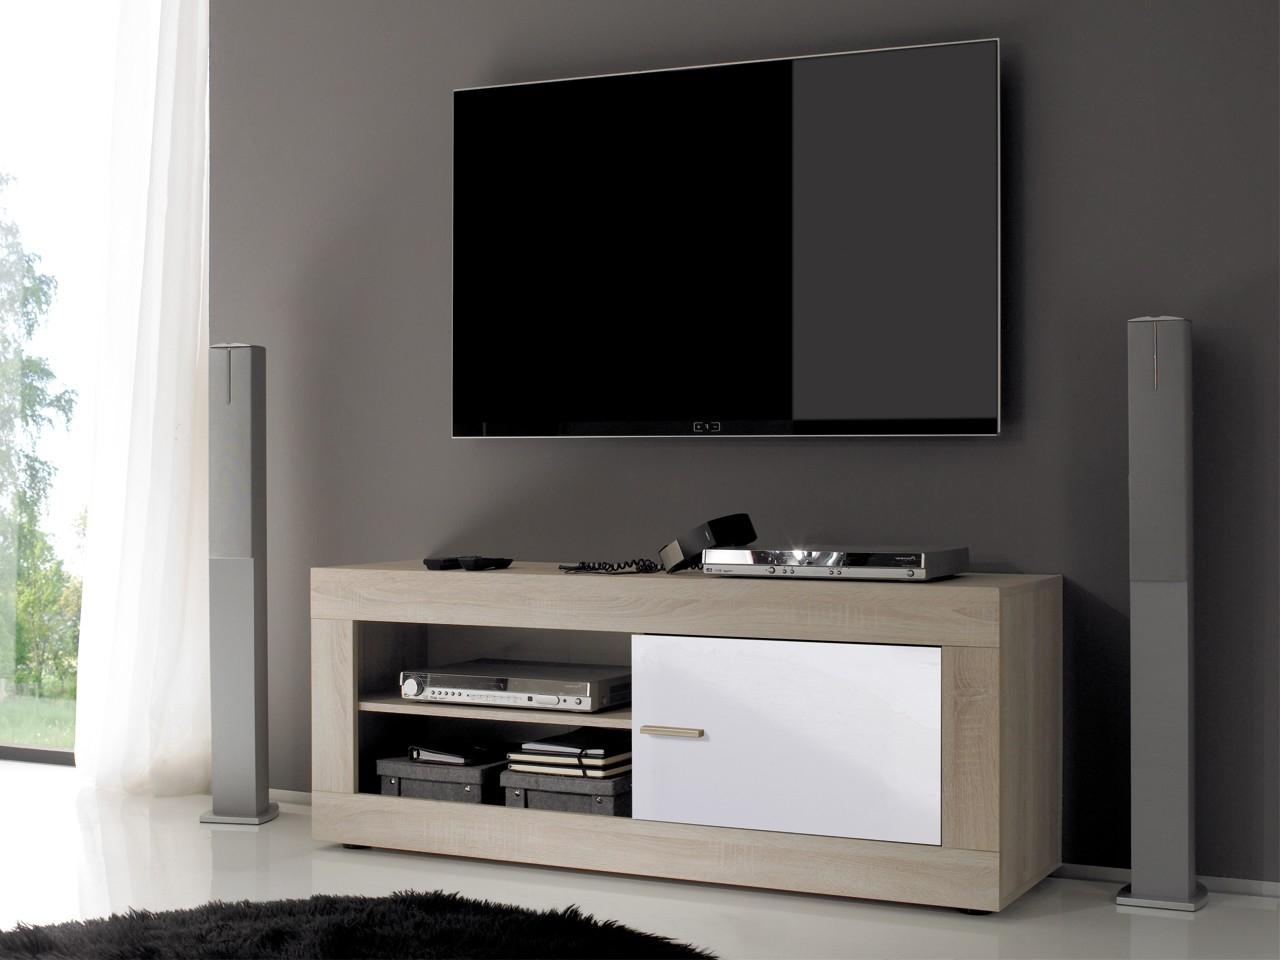 Mueble Tv Barato Jxdu Muebles Tv Modernos Nature Lux